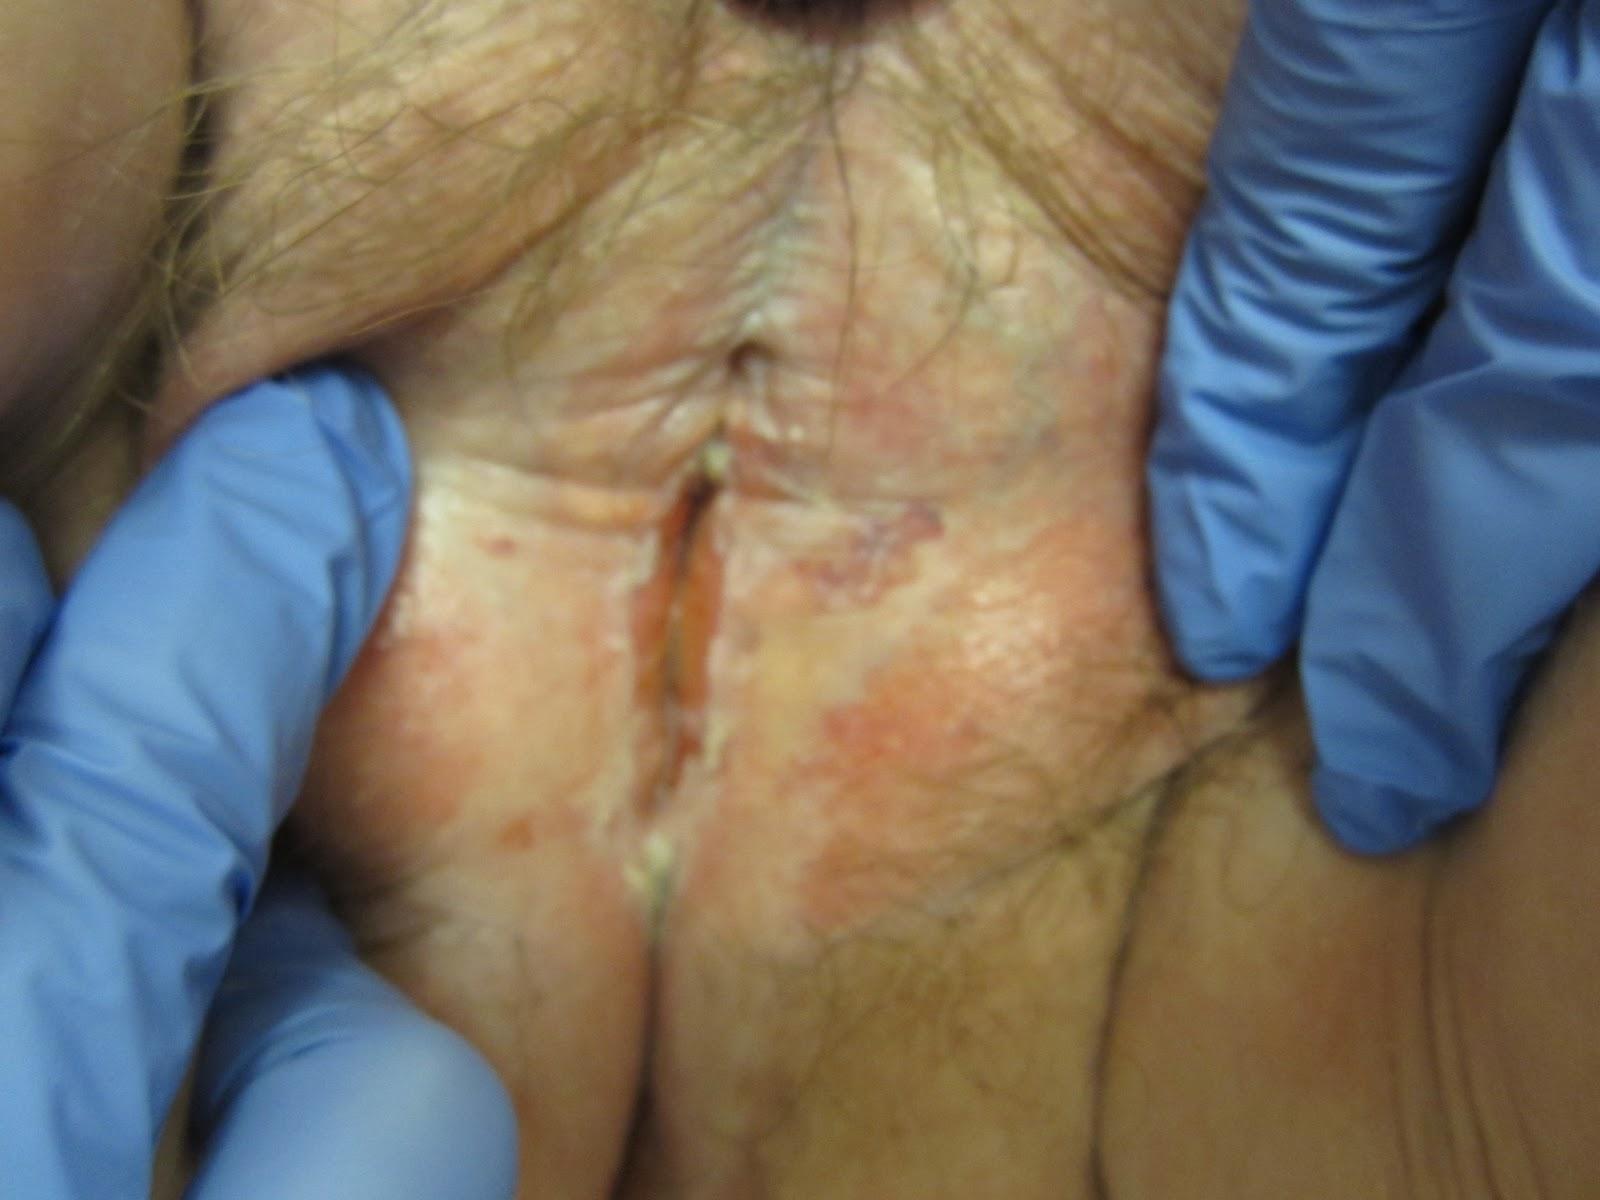 Viral skin infections | DermNet New Zealand